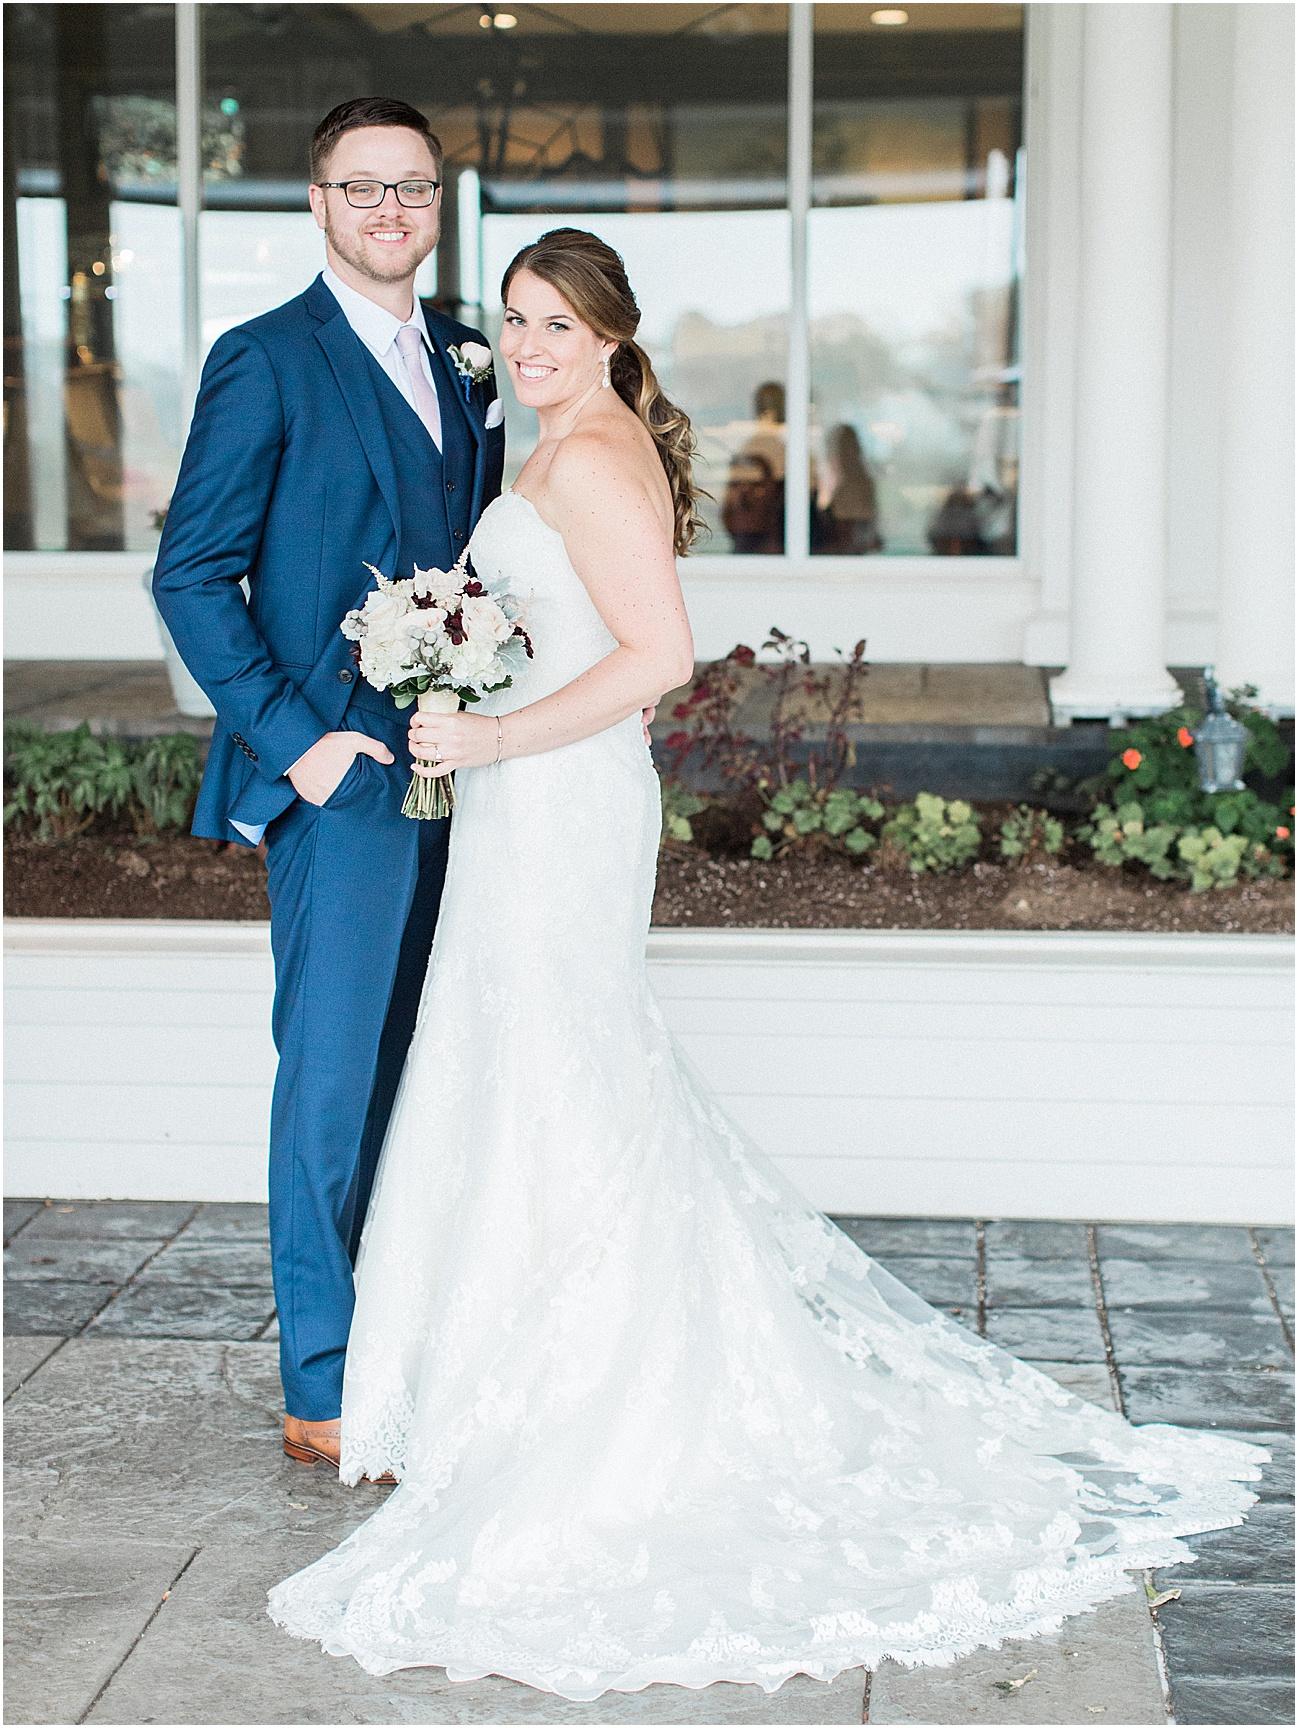 danielle_sean_willowbend_rain_rainy_day_cape_cod_boston_wedding_photographer_meredith_jane_photography_photo_1670.jpg